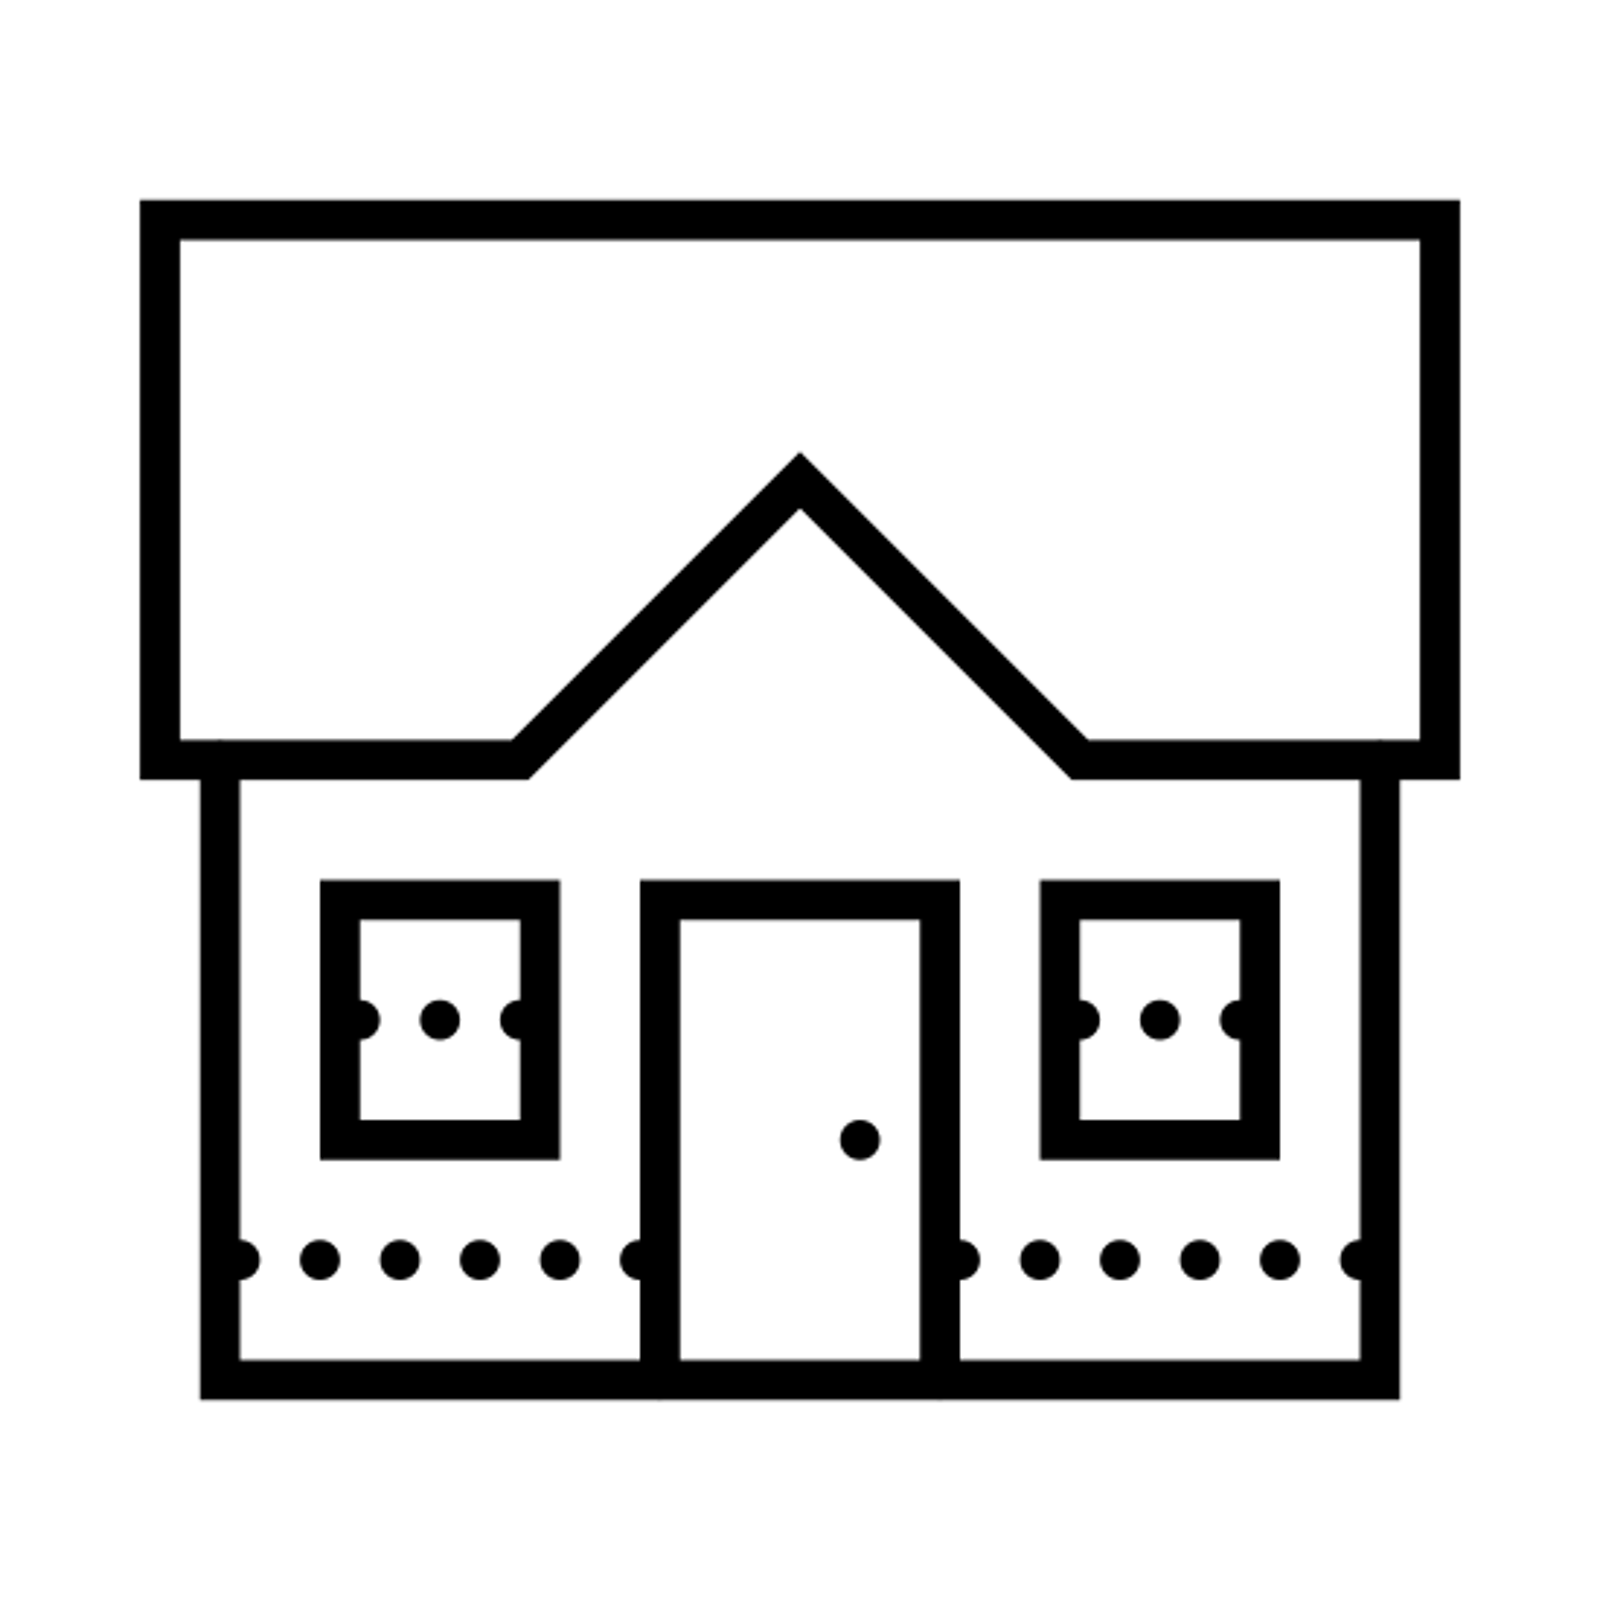 Chata icon